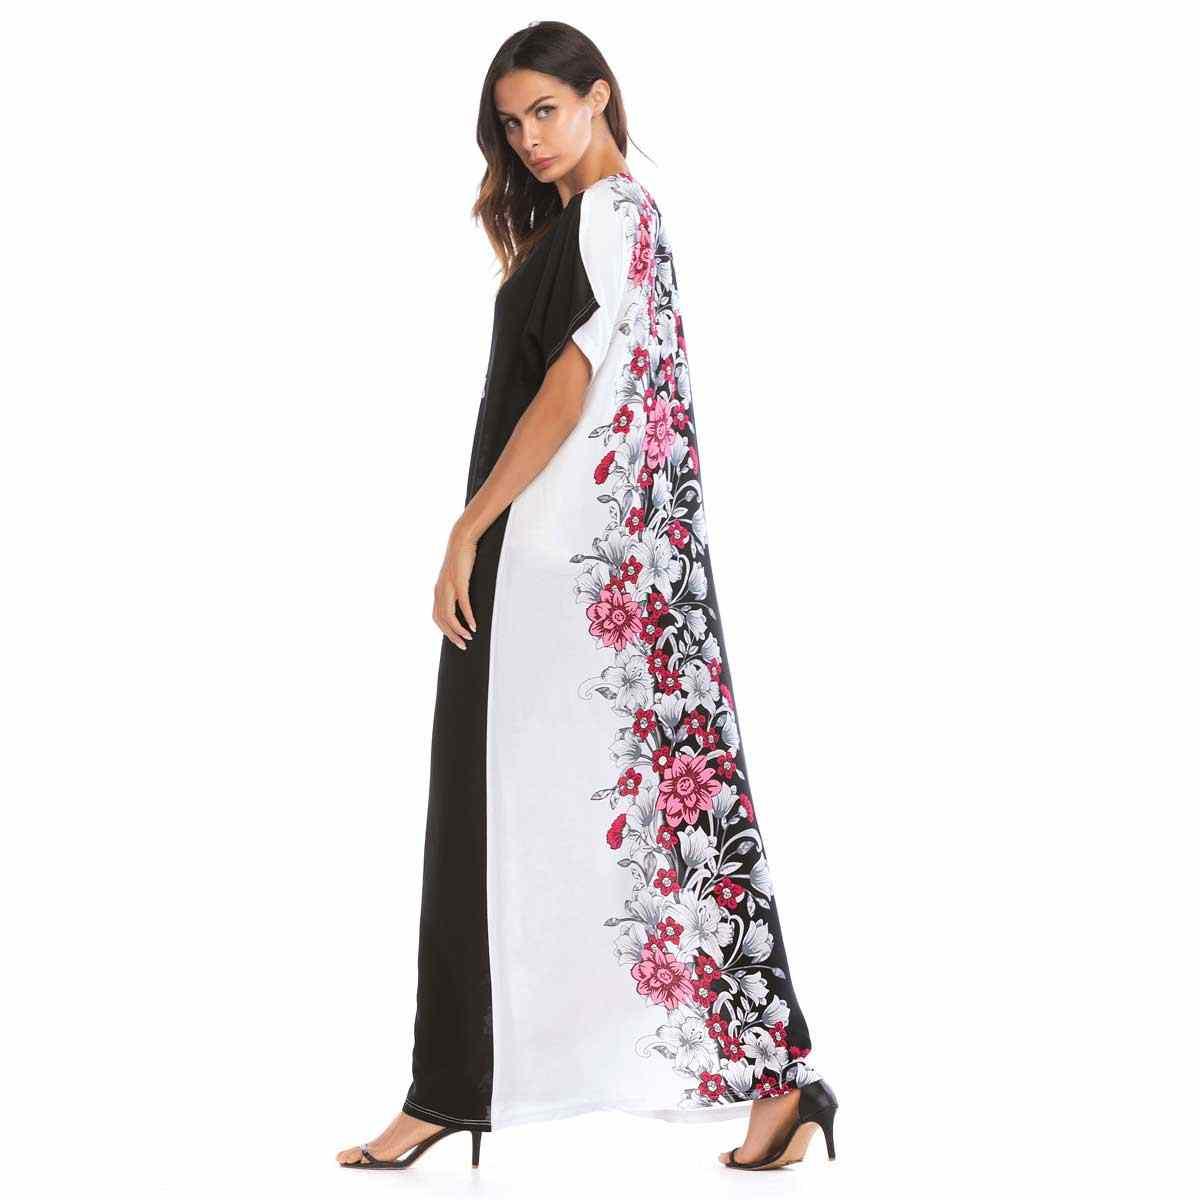 818ee4021ce03 2019 Summer Fashion Floral Print Maxi Dress Short Sleeve Casual Embroidery  Women Muslim Dress Islamic Arab Dubai Abaya VKDR1586